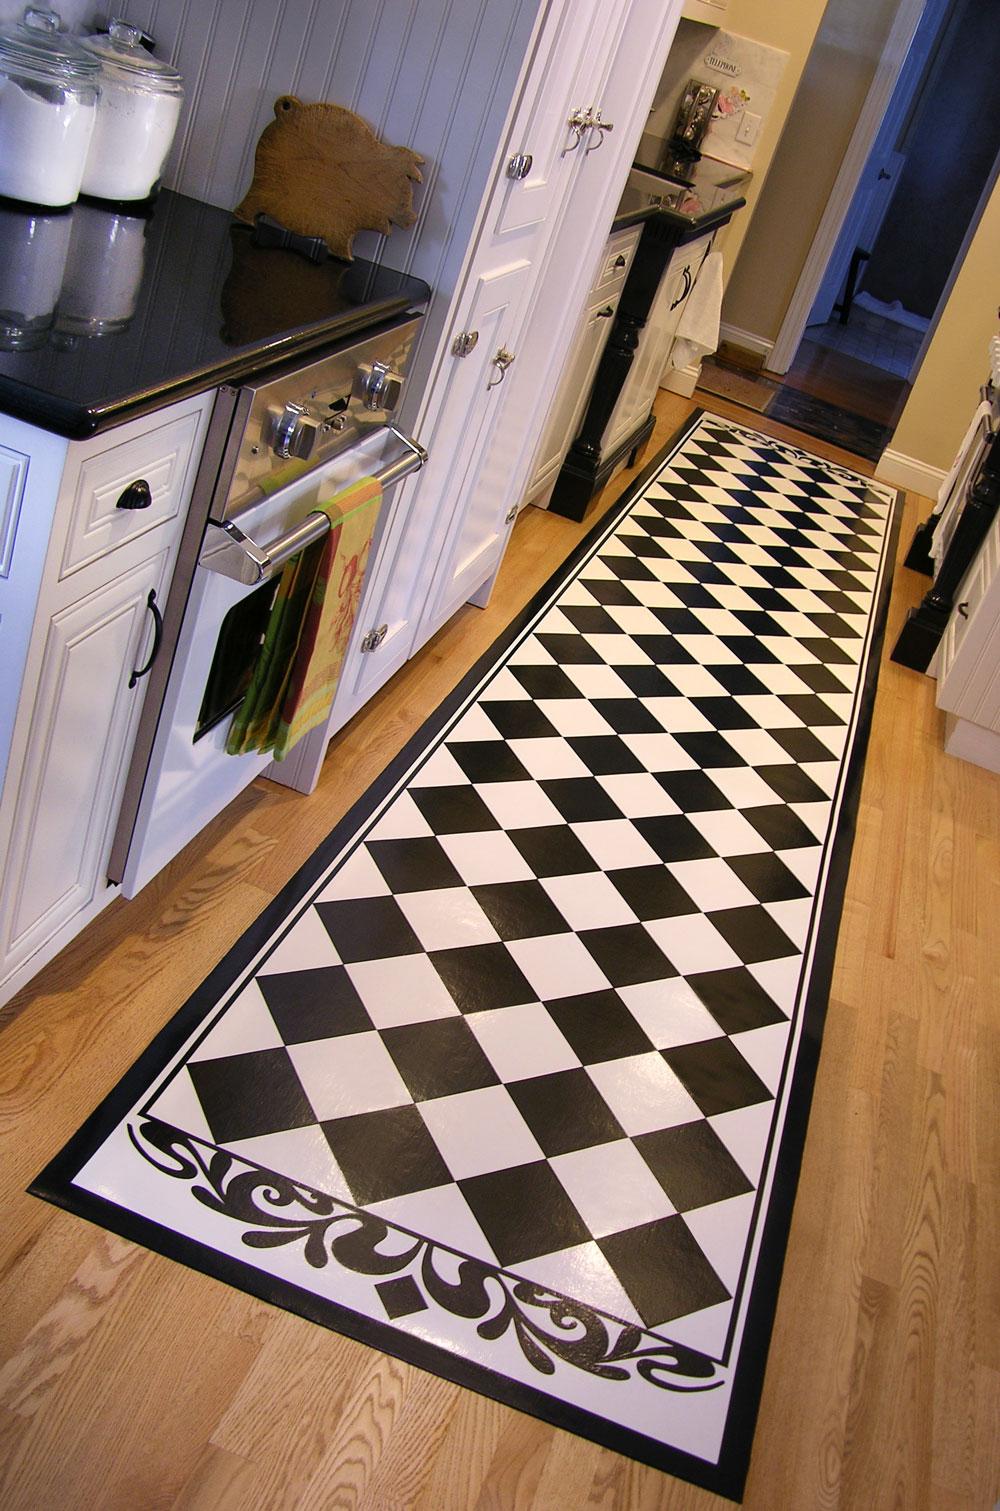 kitchen floor runner cabinets lowes long runners studio k blog pic1 pic2 47